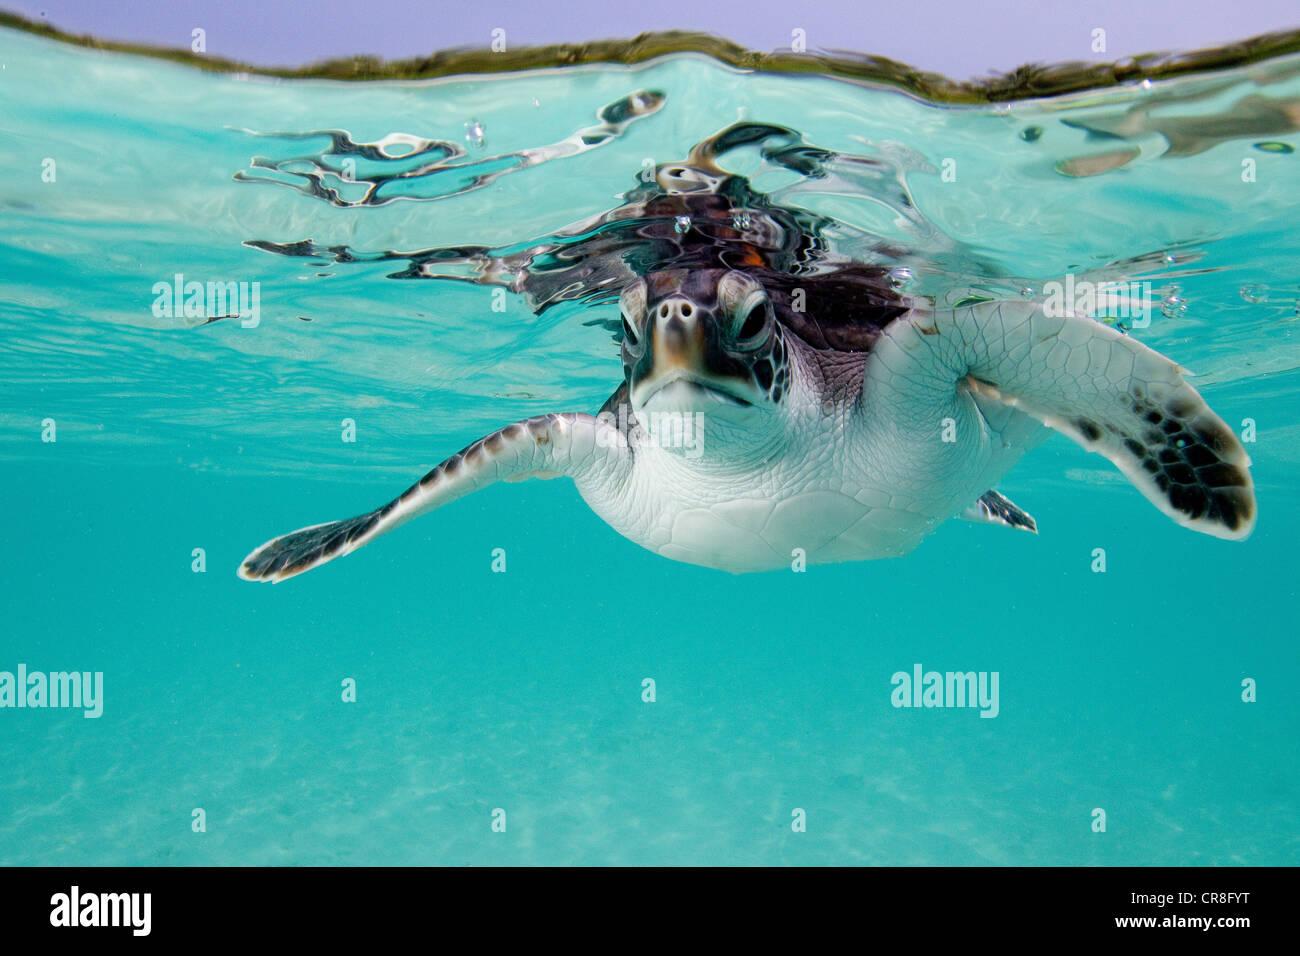 Anatomy Turtle Stock Photos & Anatomy Turtle Stock Images - Alamy